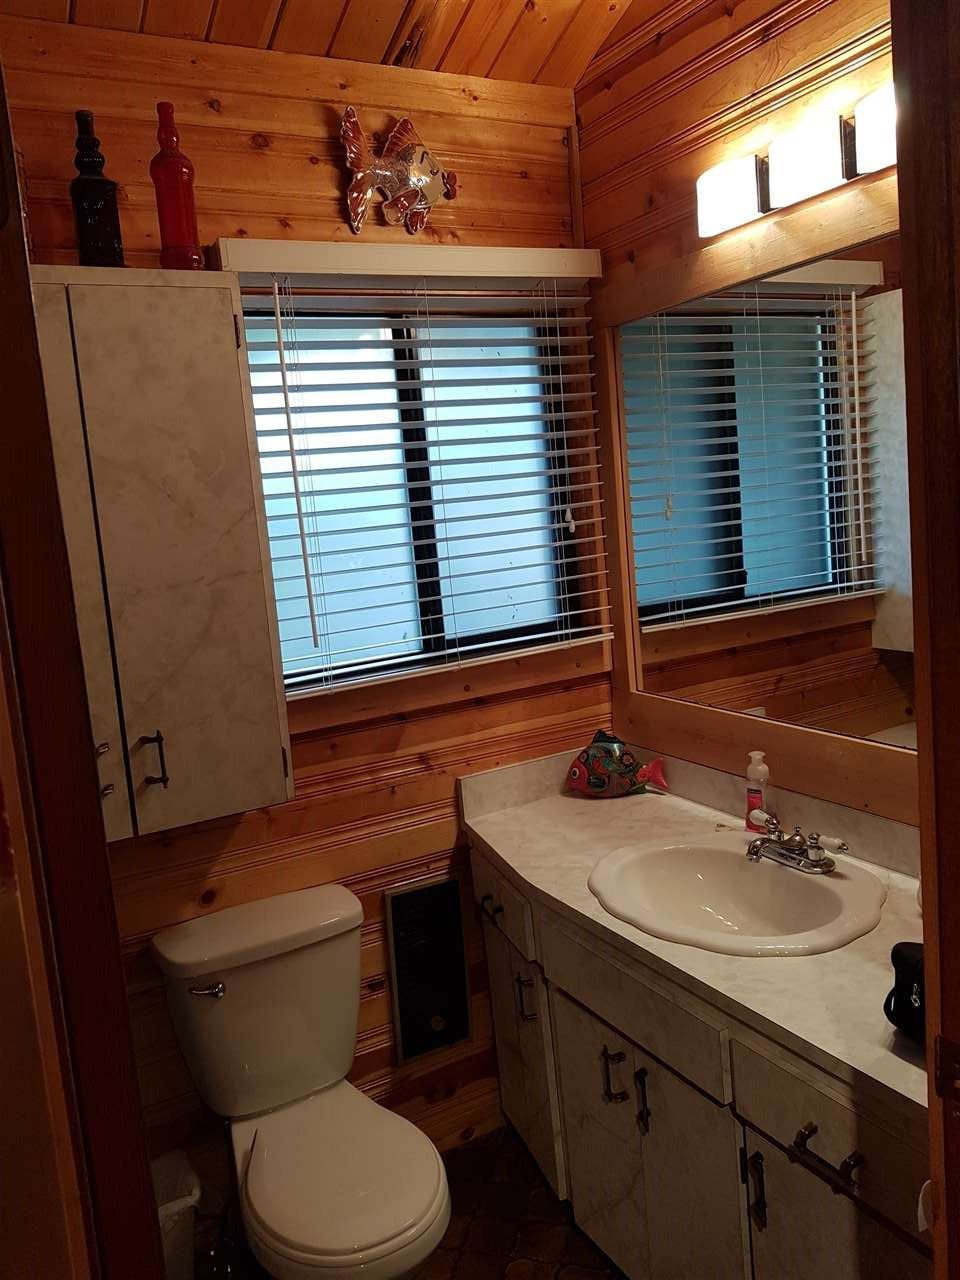 Photo 16: Photos: 7898 DEAN Road in Bridge Lake: Bridge Lake/Sheridan Lake House for sale (100 Mile House (Zone 10))  : MLS®# R2274404